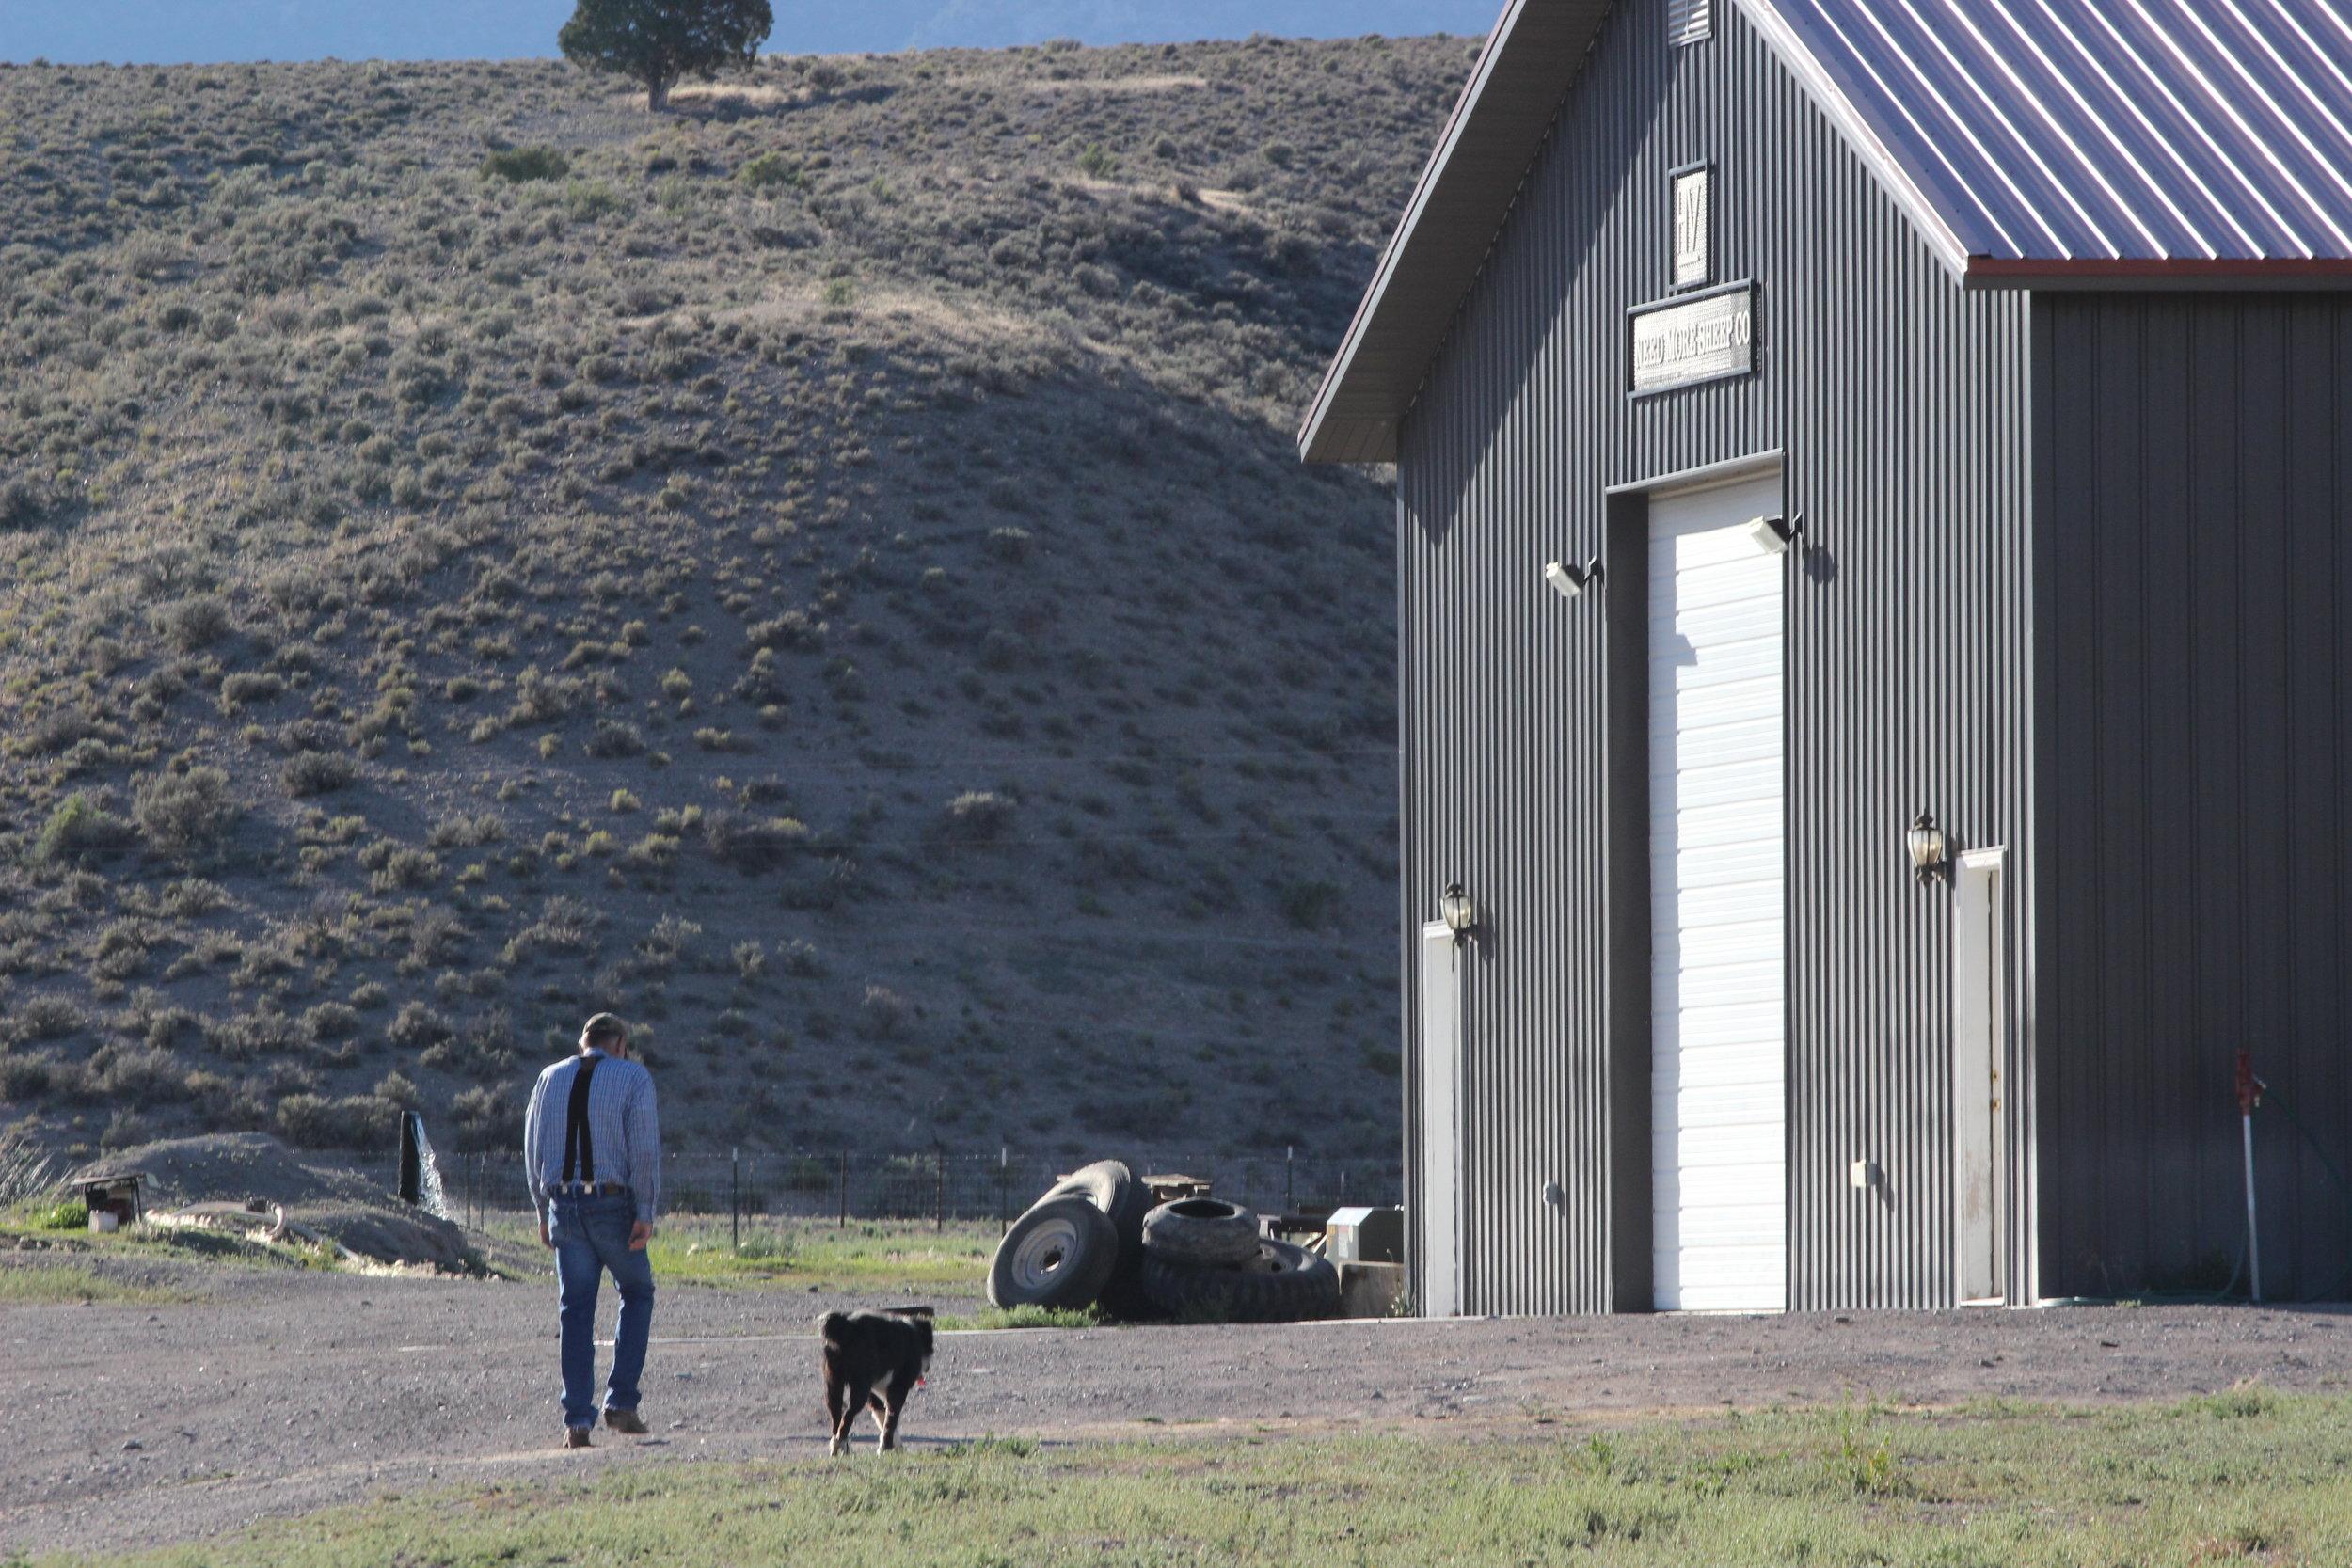 Hank Vogler, Need More Sheep Company